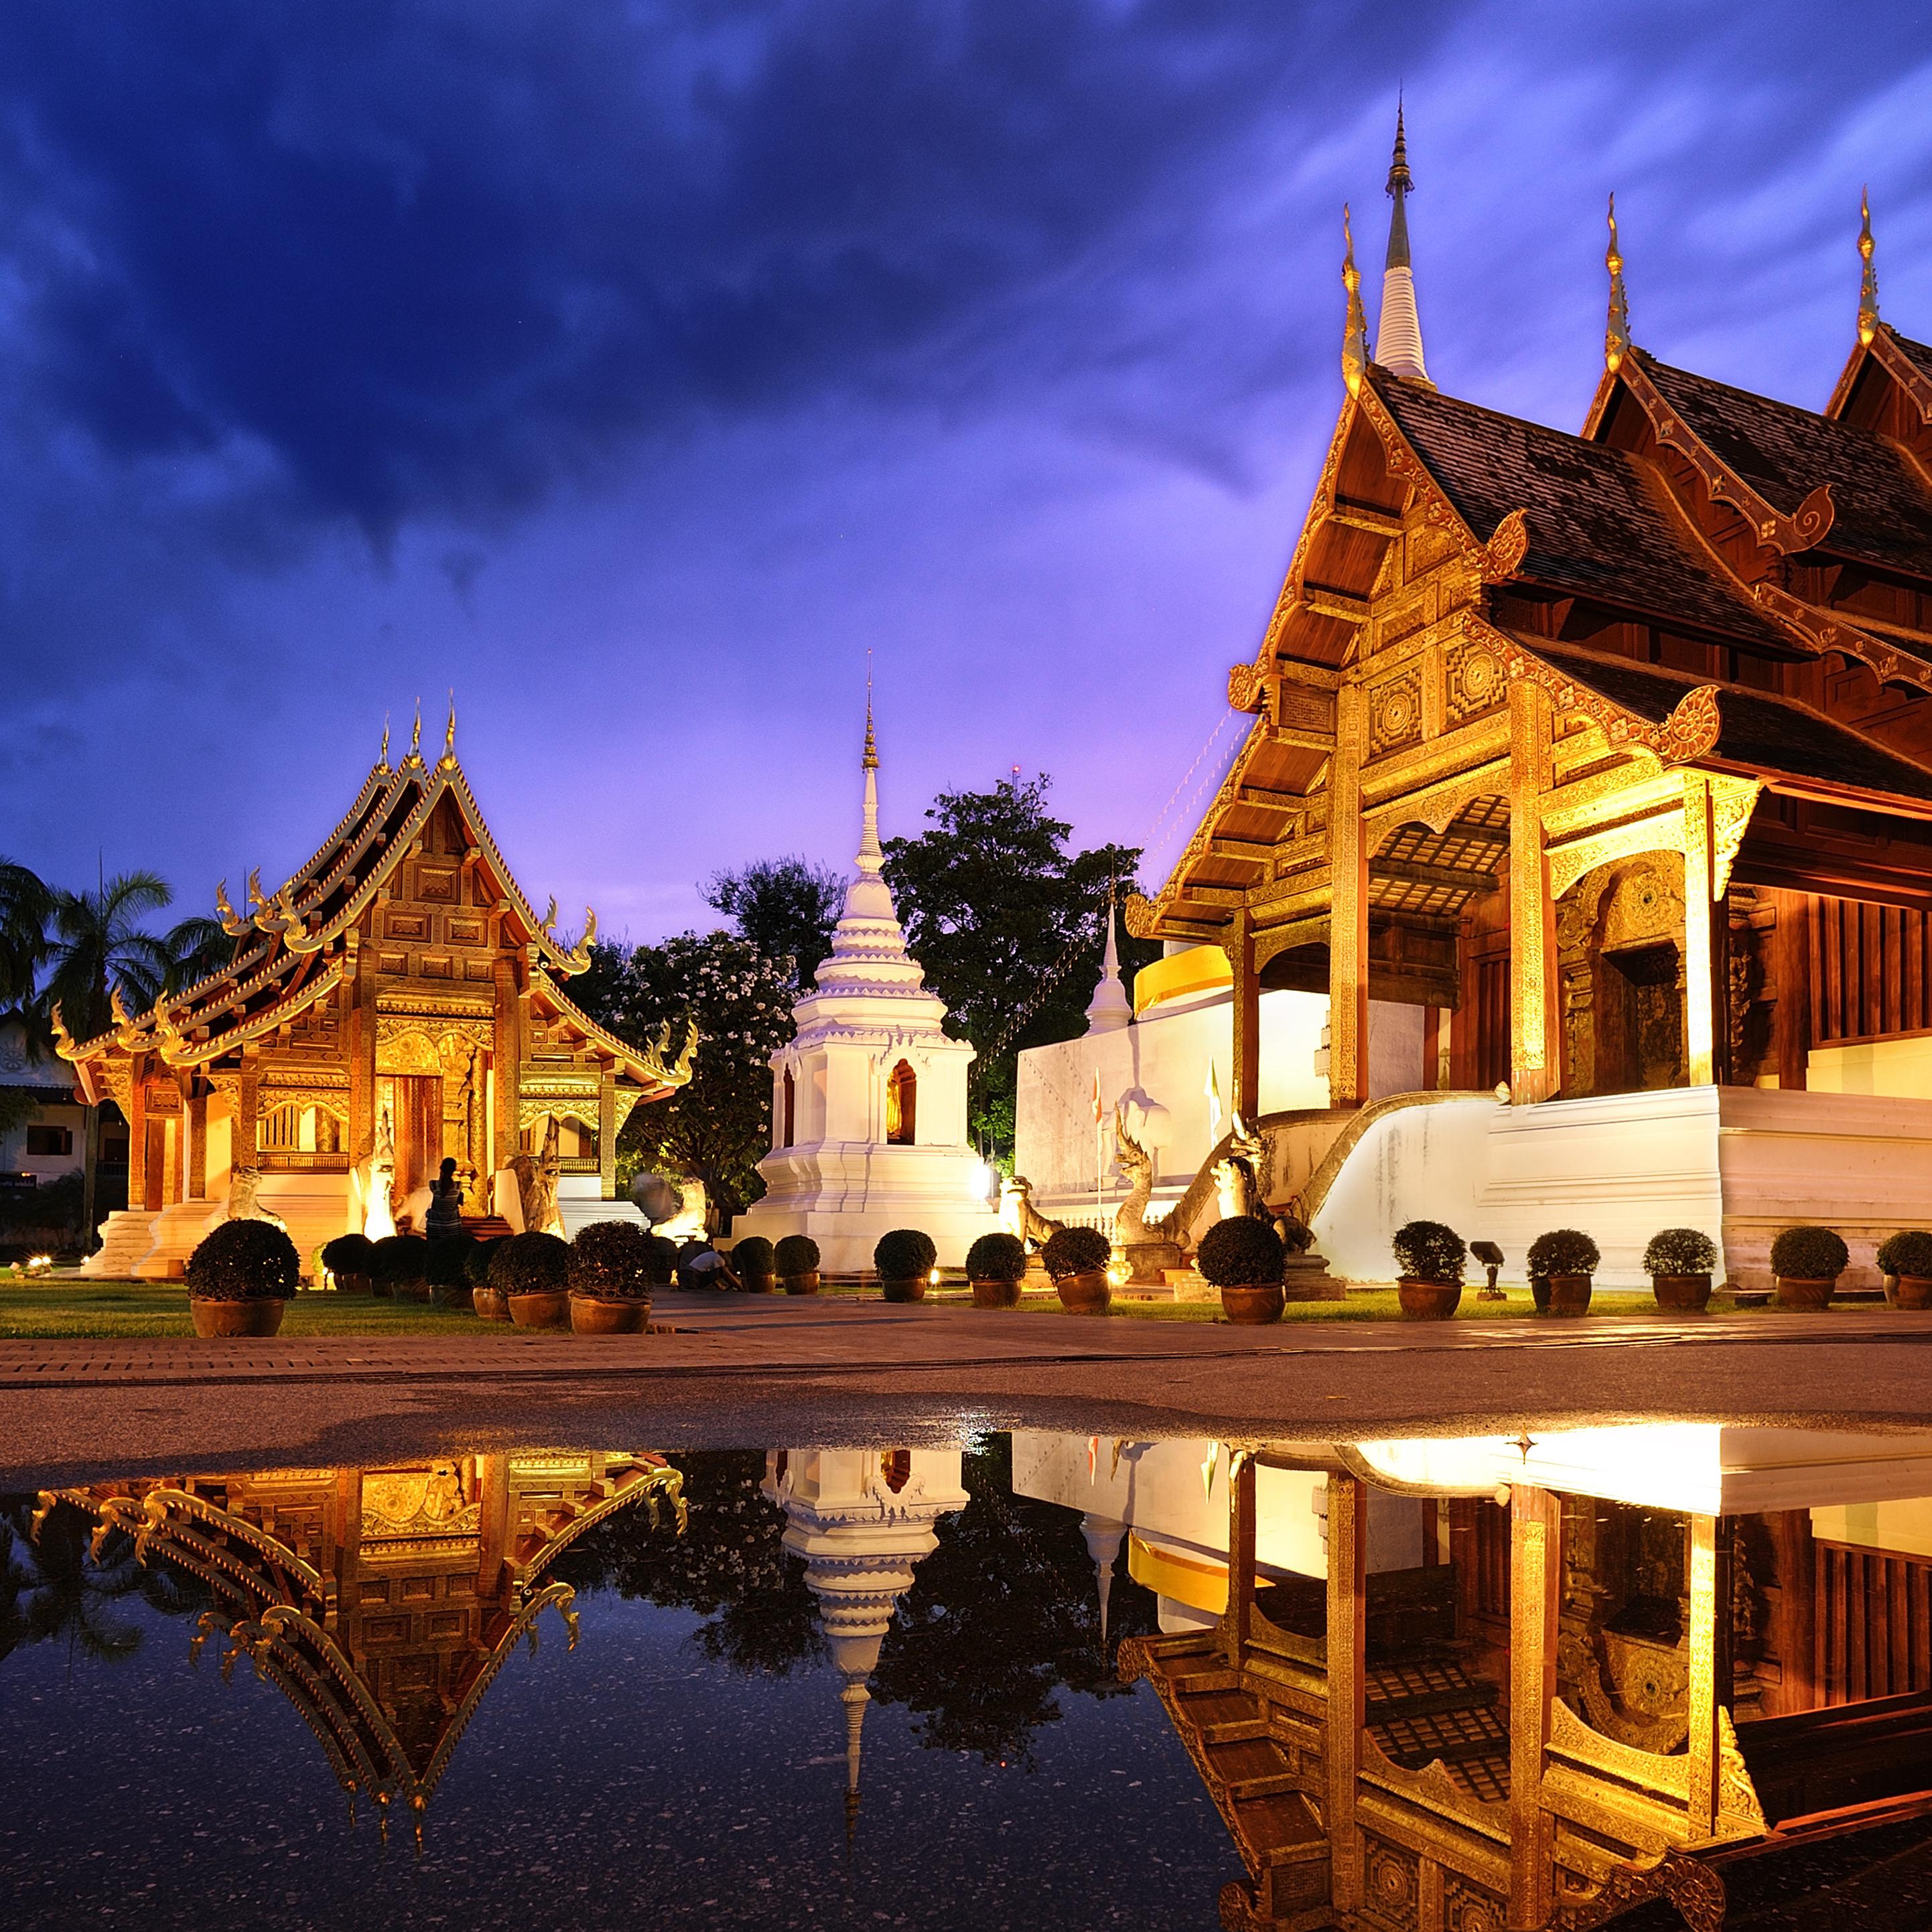 Phra Singh temple twilight time